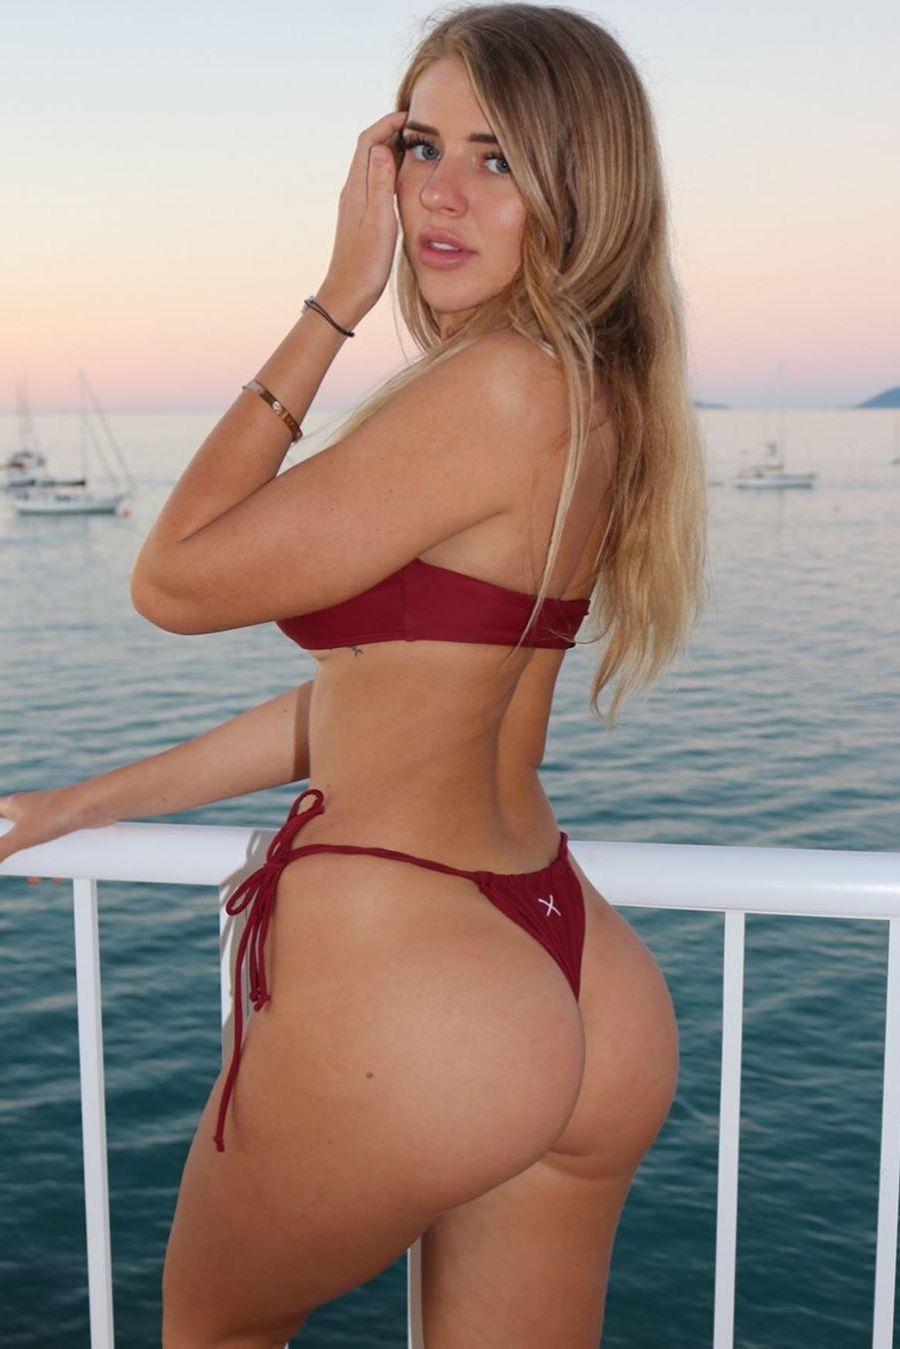 Hot girl with amazing ass in thong bikini ⋆ Pandesia World